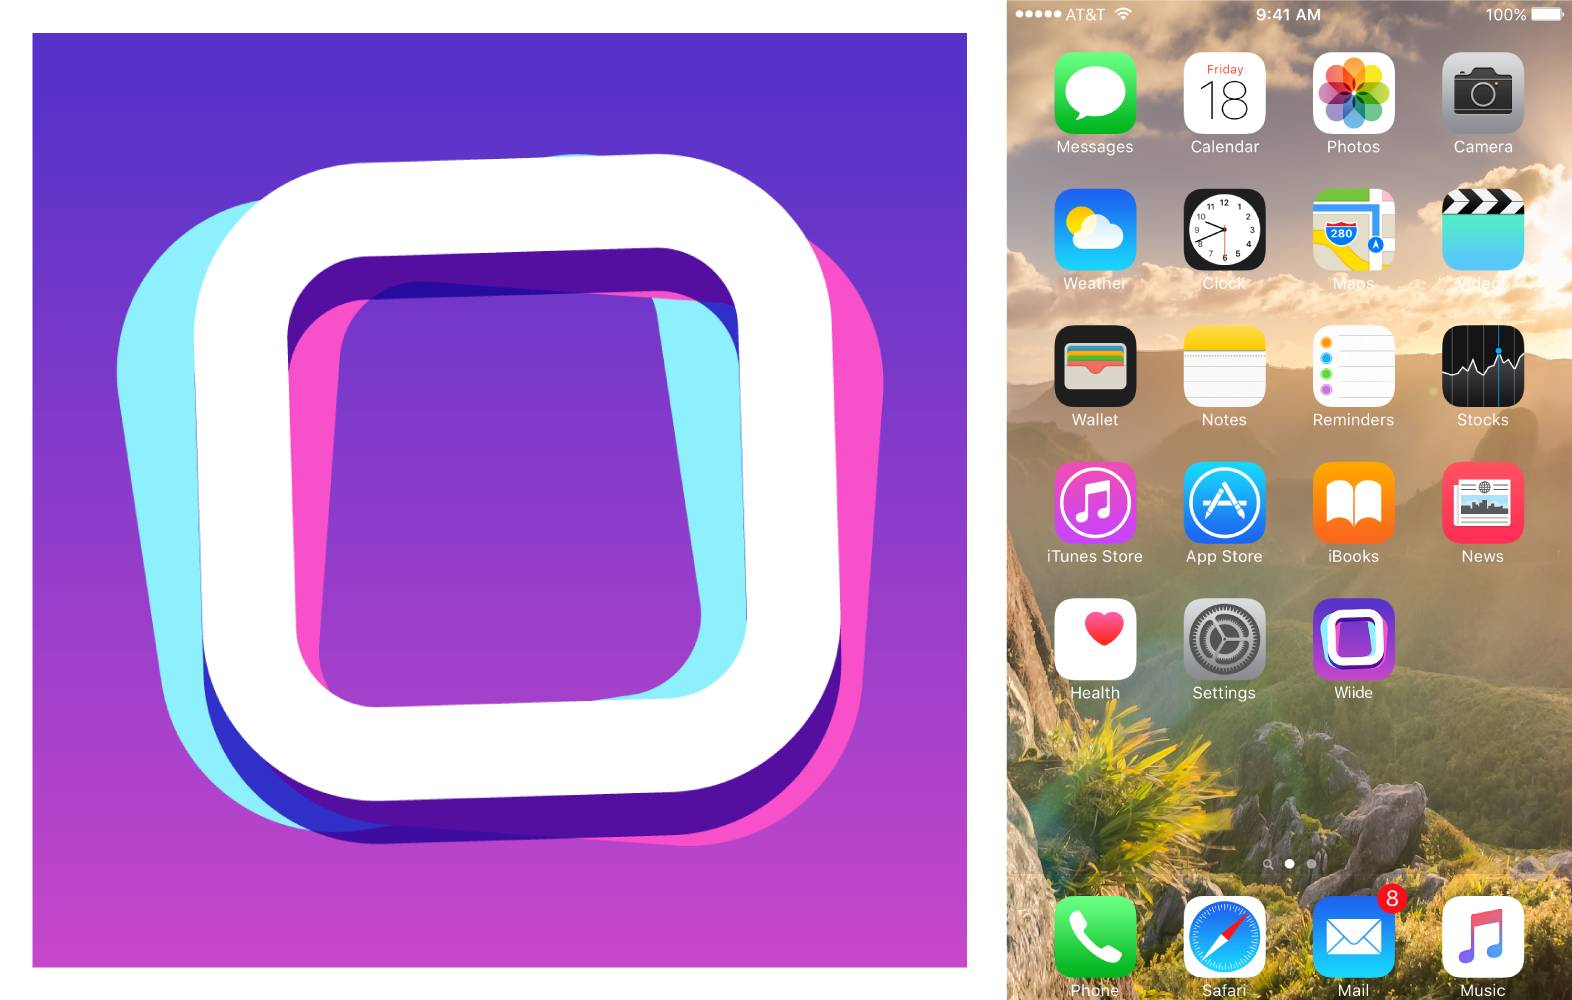 wiide app icon – concept